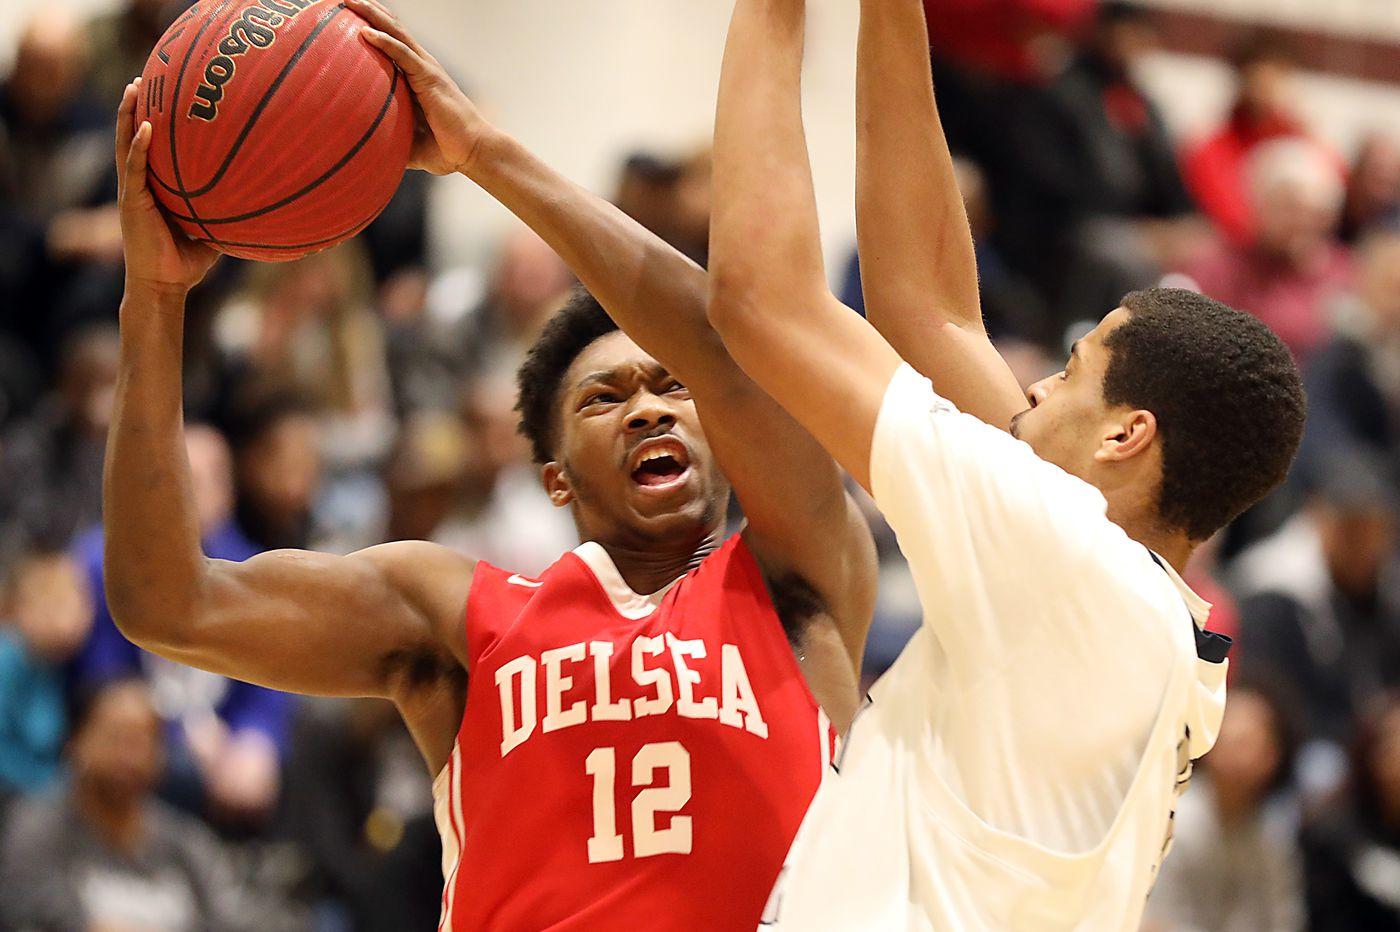 Saturday's South Jersey roundup: Dan Fleming helps Haddonfield boys' basketball edge Willingboro